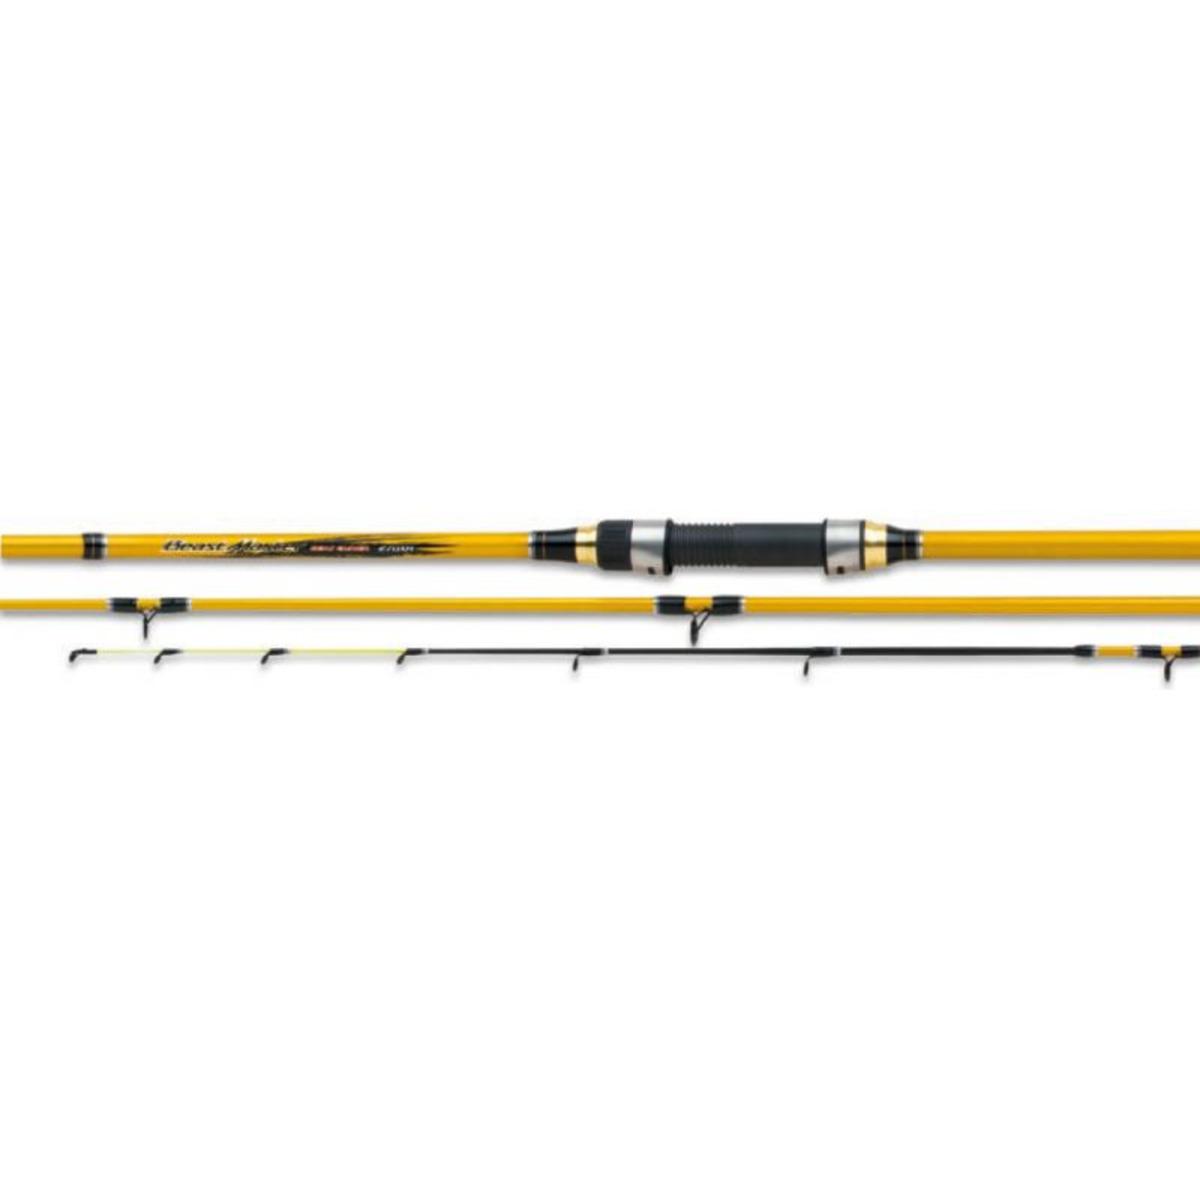 Shimano Beastmaster Boat Quiver - 2.70 m - 250 g